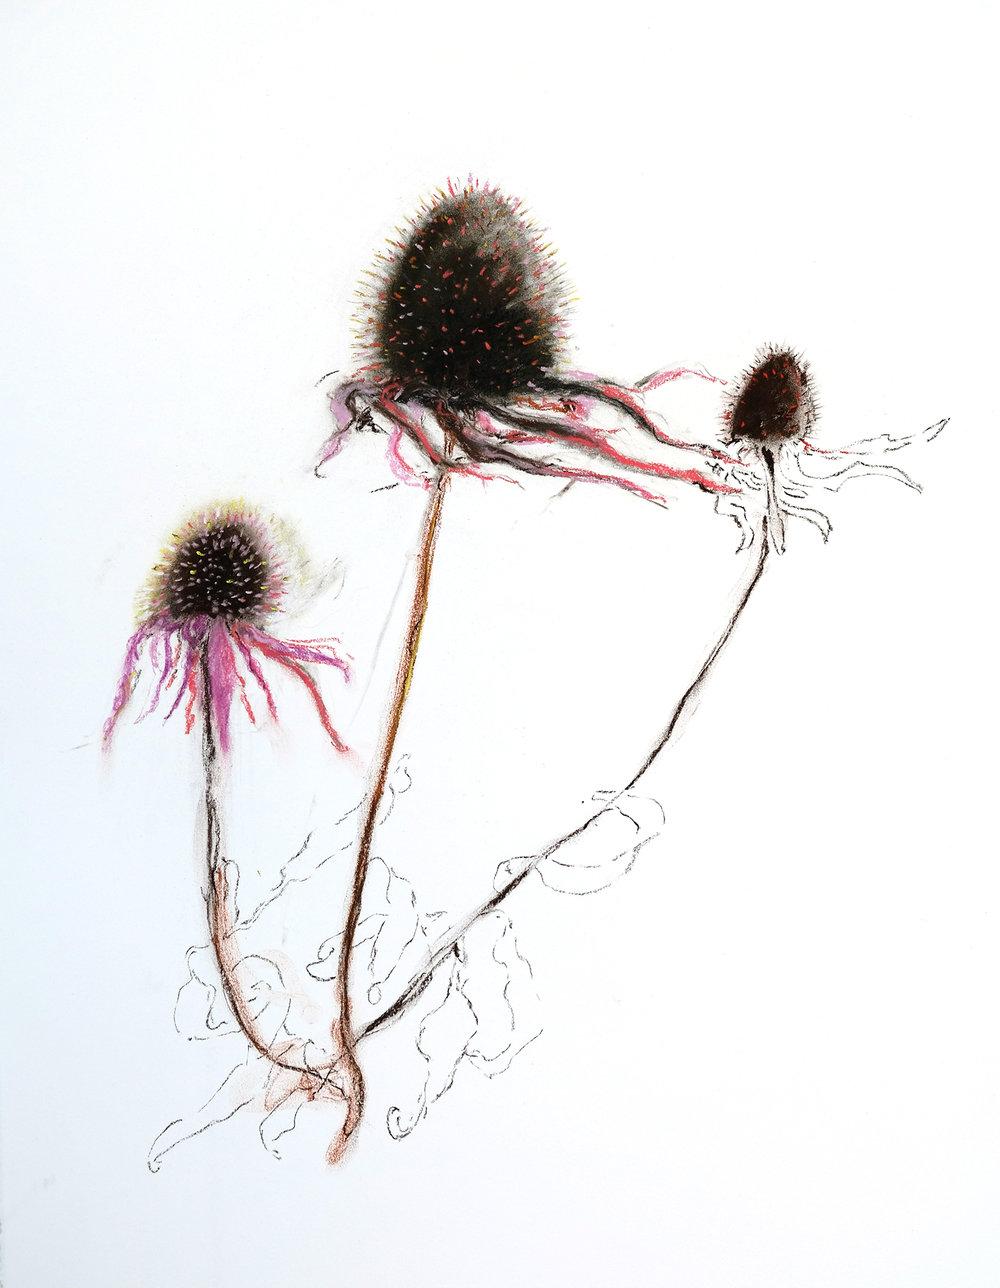 Dried Echinacea